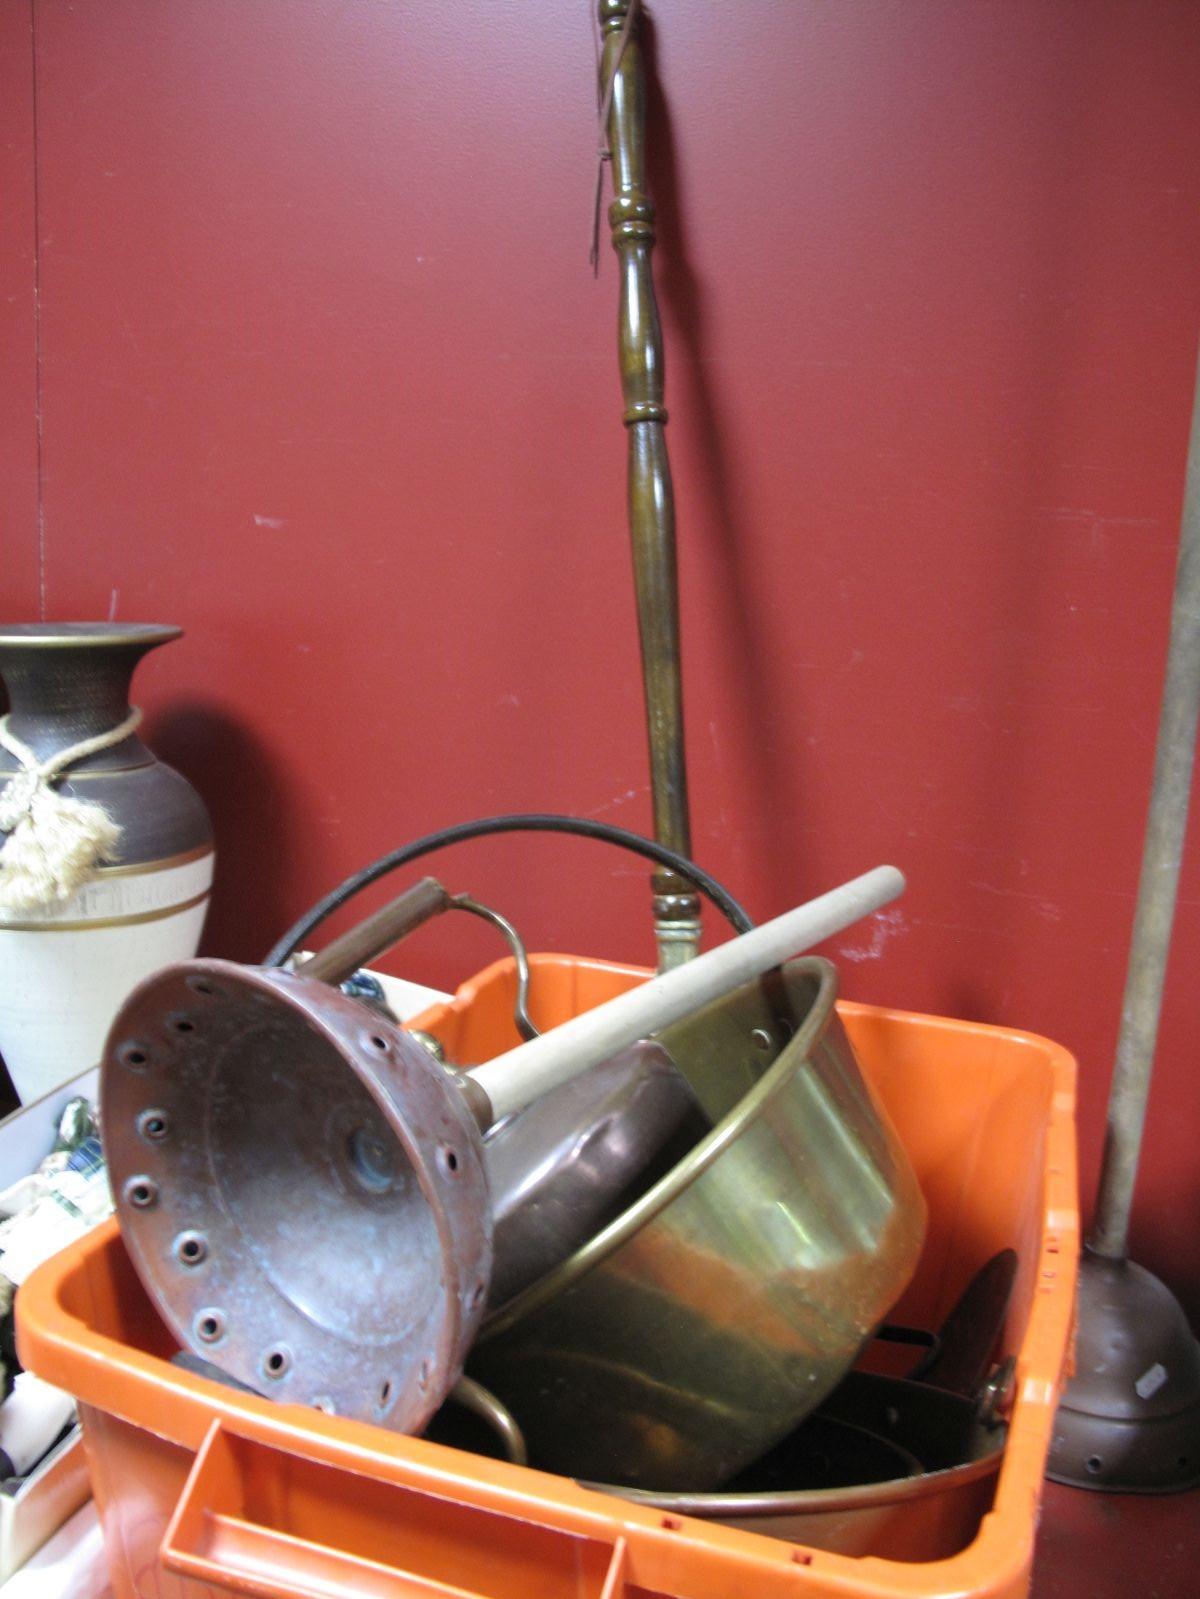 Lot 712 - A XIX Century Copper Kettle, brass jam pan, copper bowls, warming pan, etc.